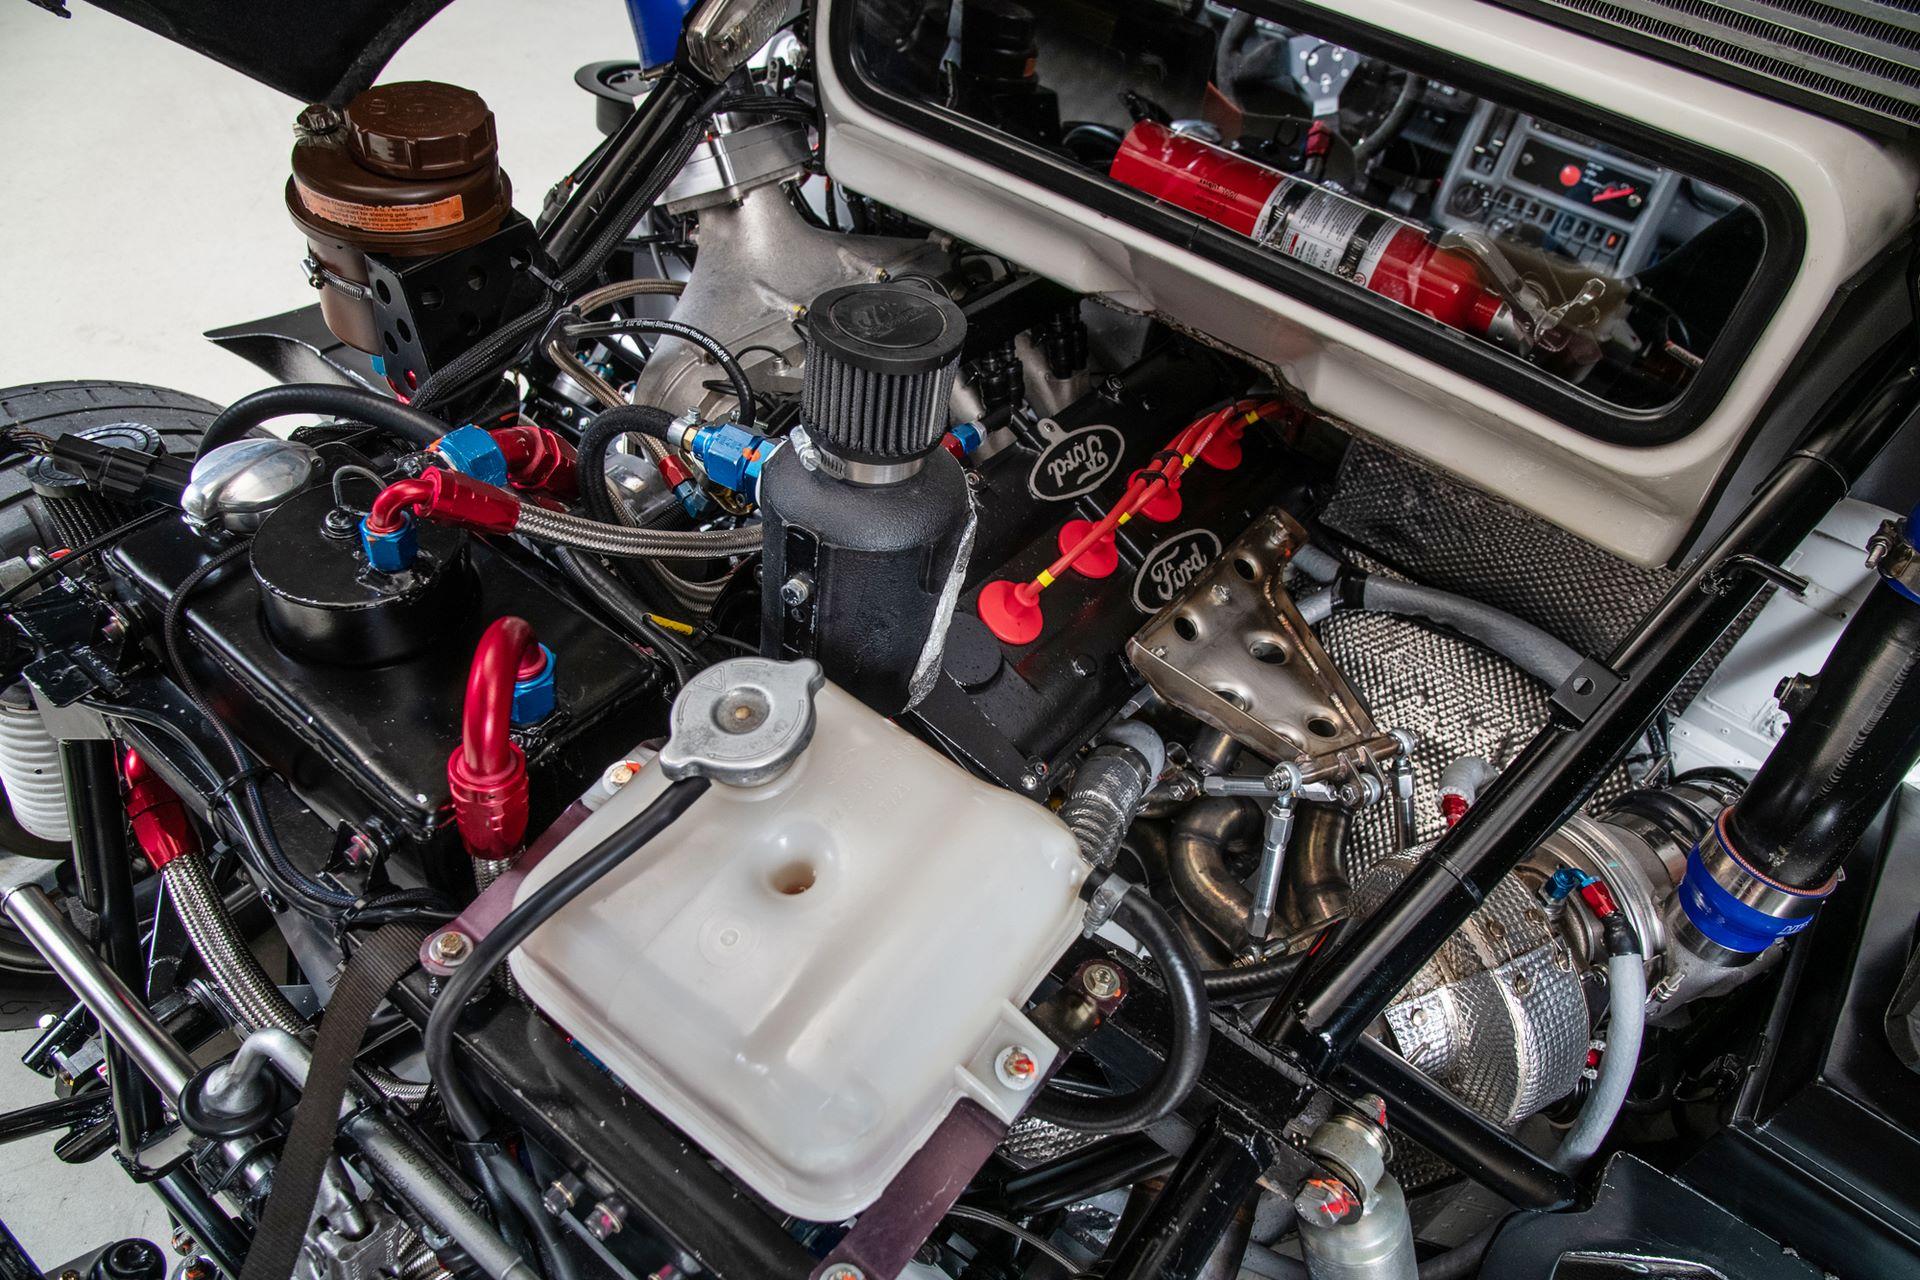 Ford-RS200-Evolution-Evo-for-sale-31